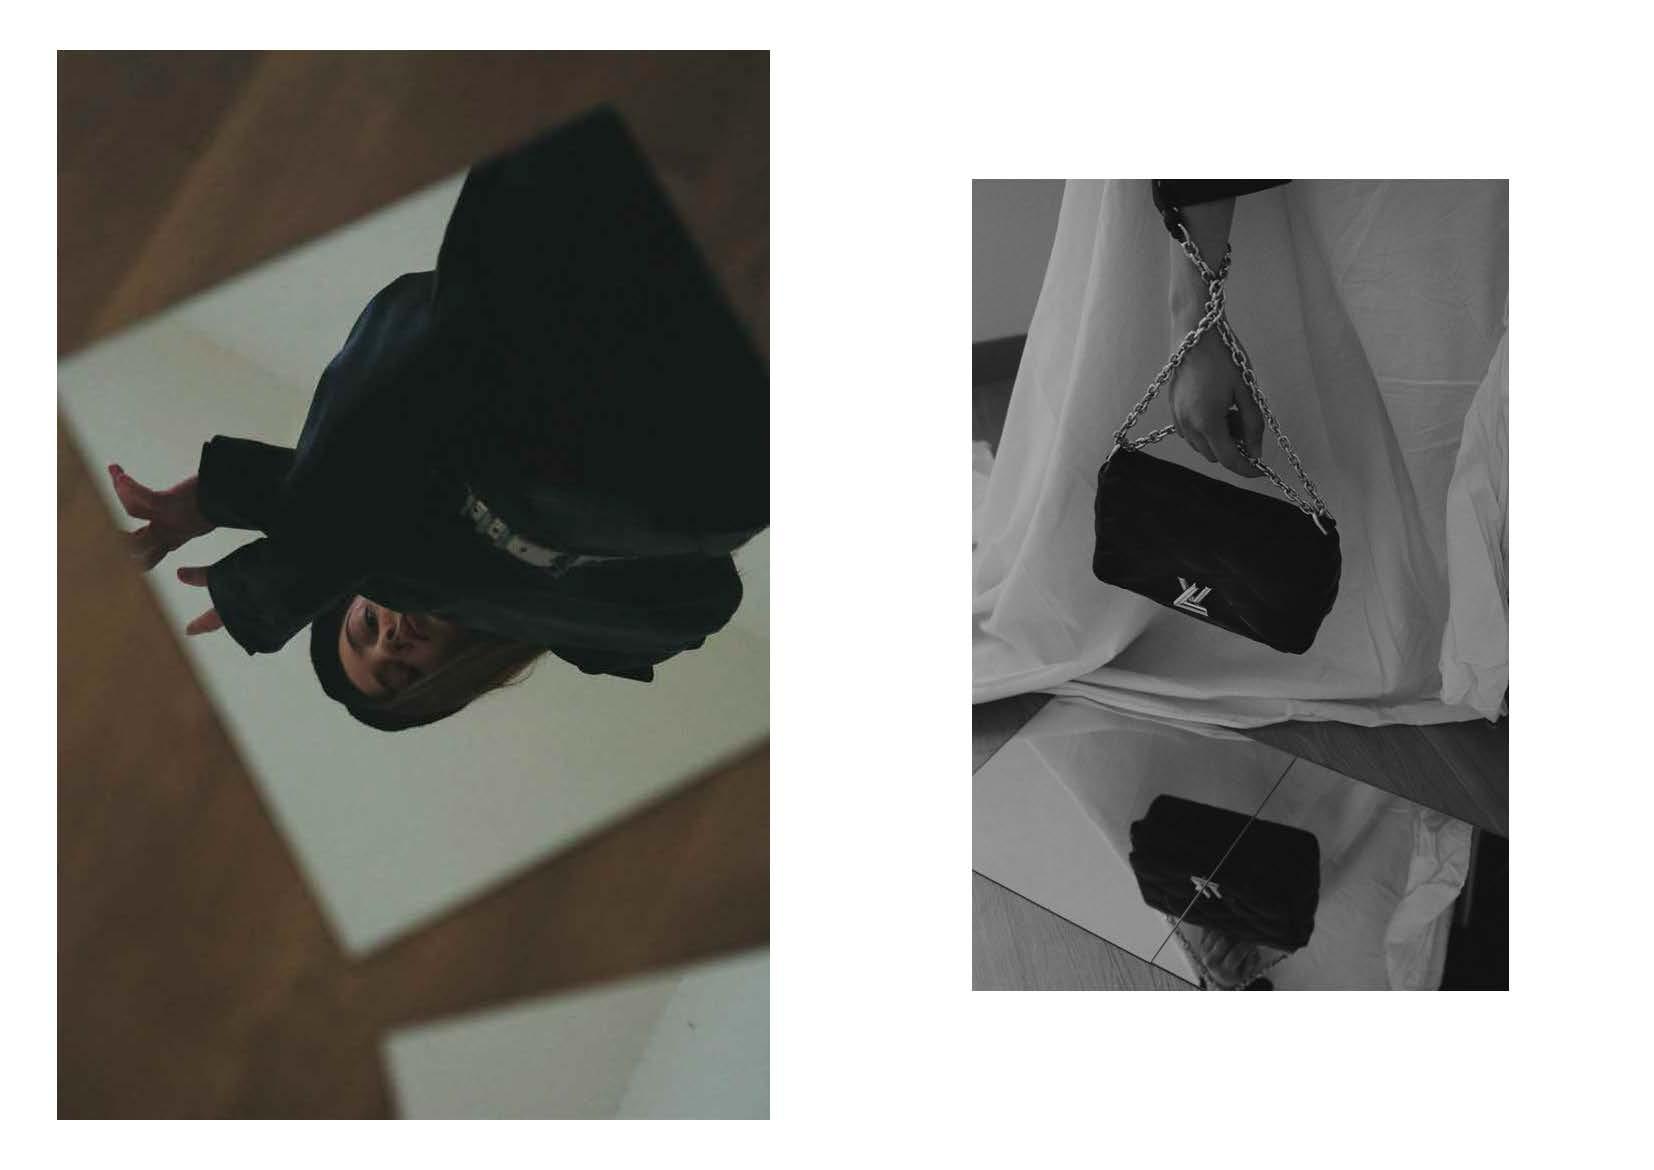 jacket KENZO VINTAGE SELECTION, asymmetrical top JACQUEMUS, black trousers LUCIO VANOTTI, silver belt and black basco STYLIST ARCHIVE, right: matelassé shoulder bag with silver chain LOUIS VUITTON